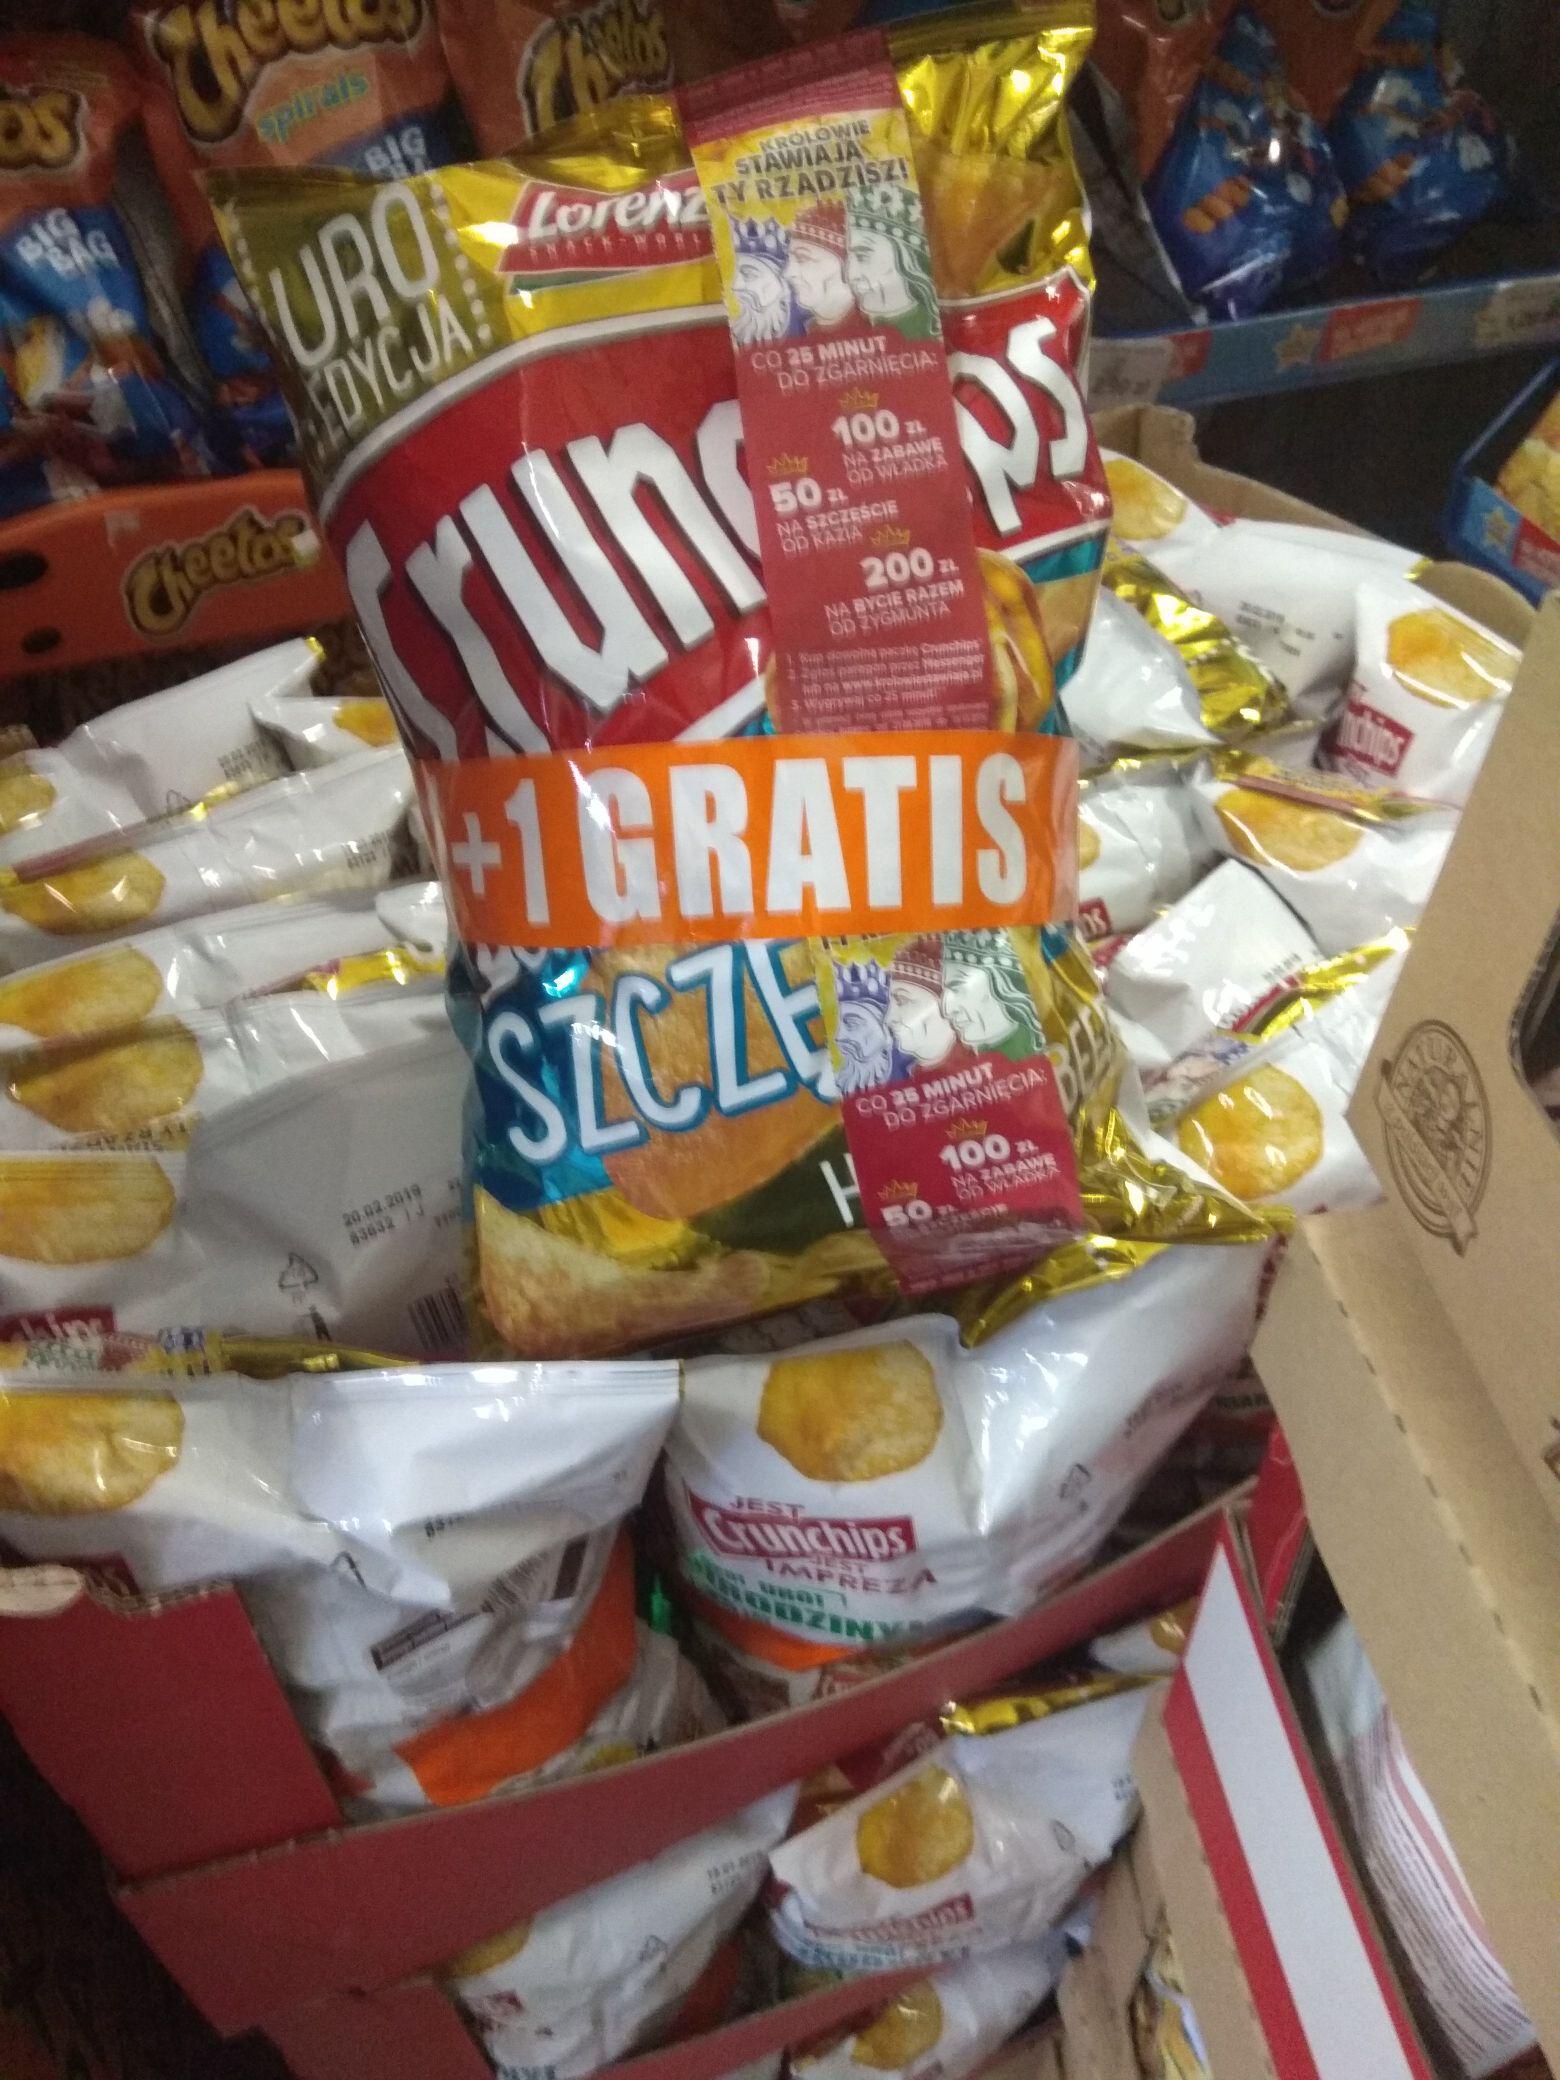 Jedna paczka gratis Crunchips @ Lewiatan